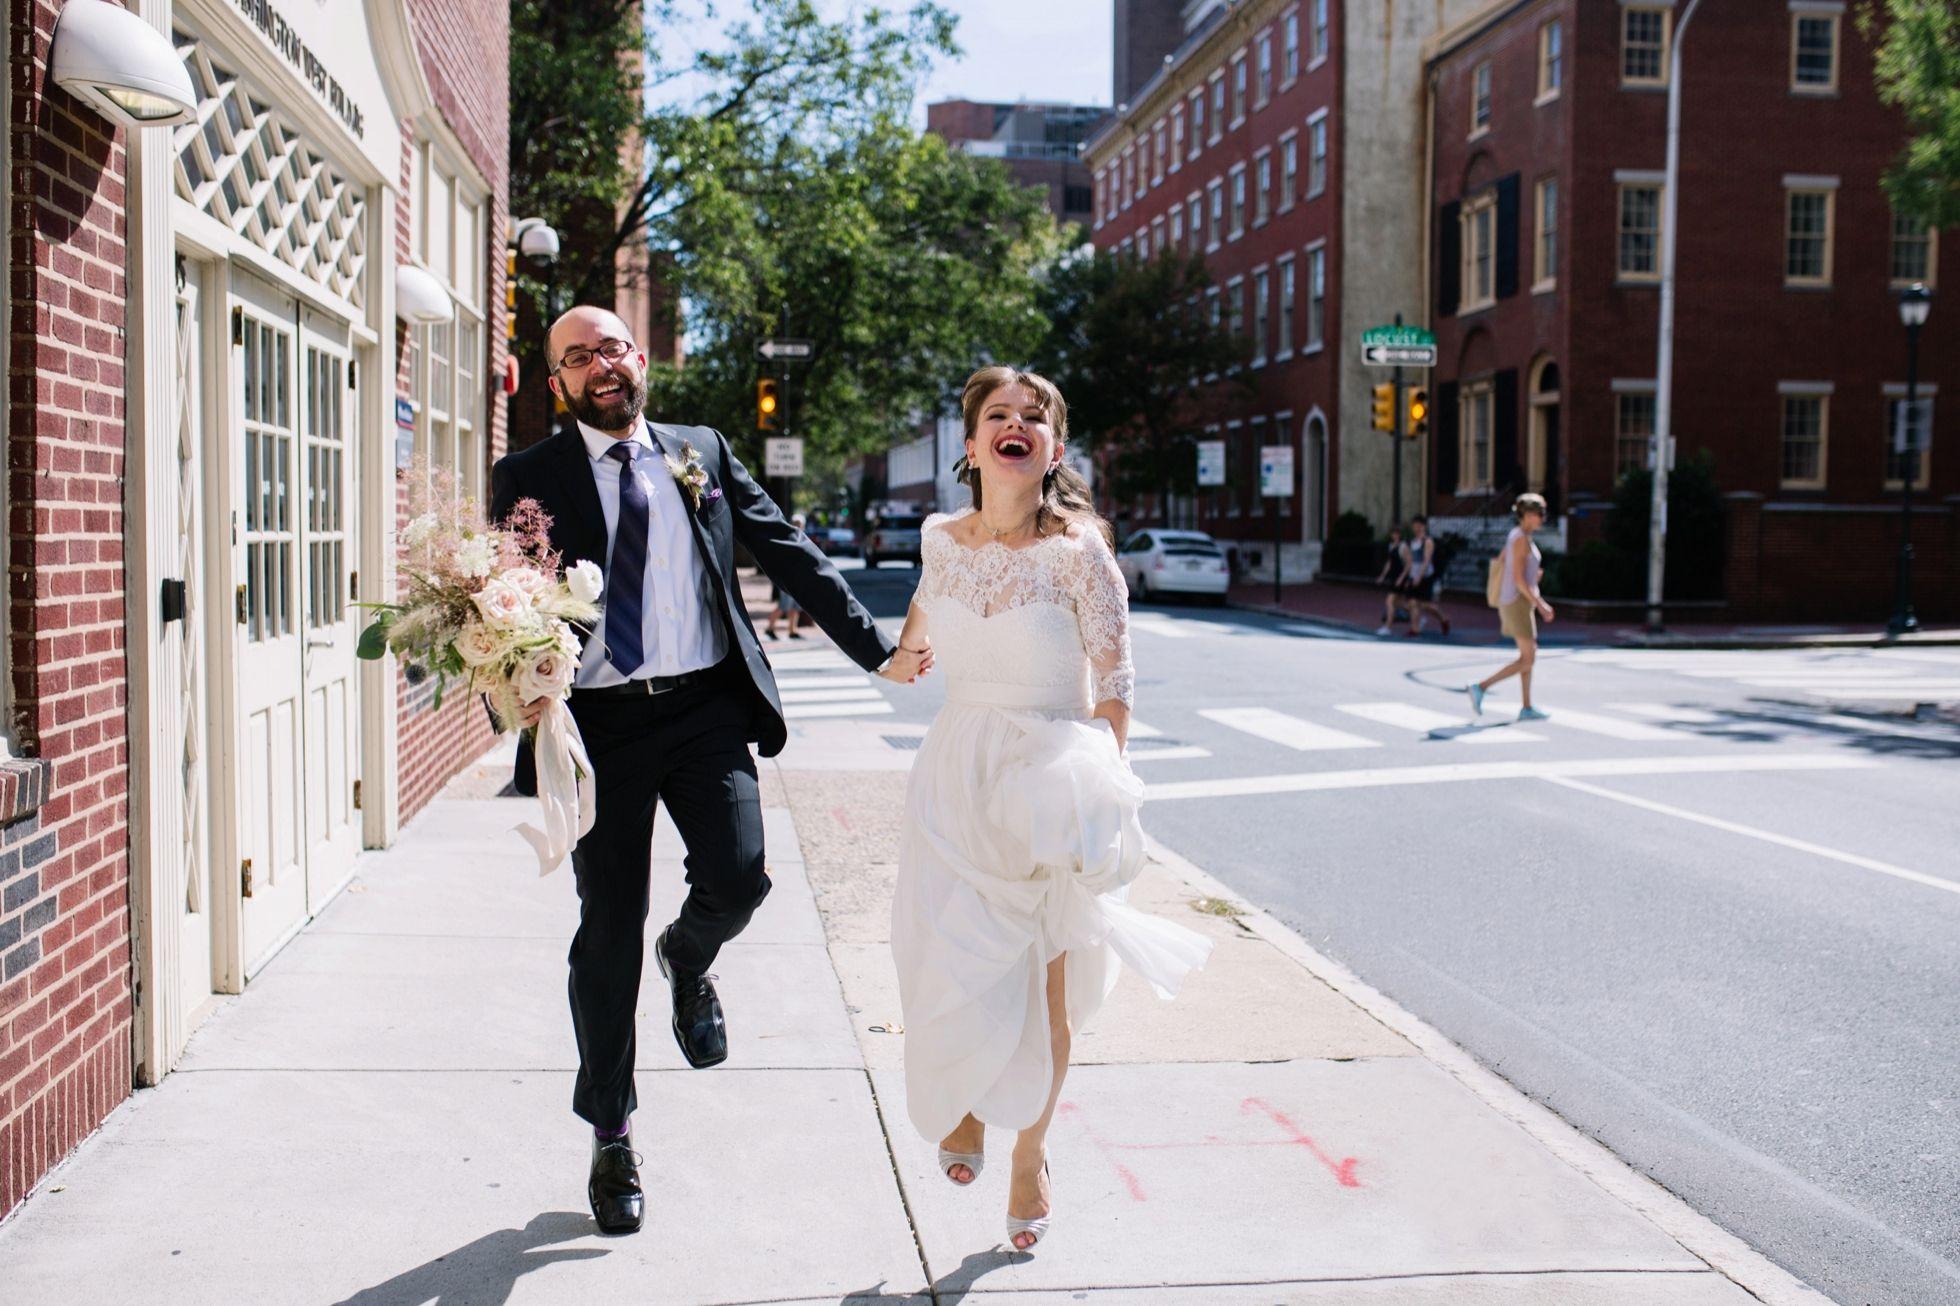 Unique Unposed Wedding Photos // a Jazzy Garden Party Wedding at the ...